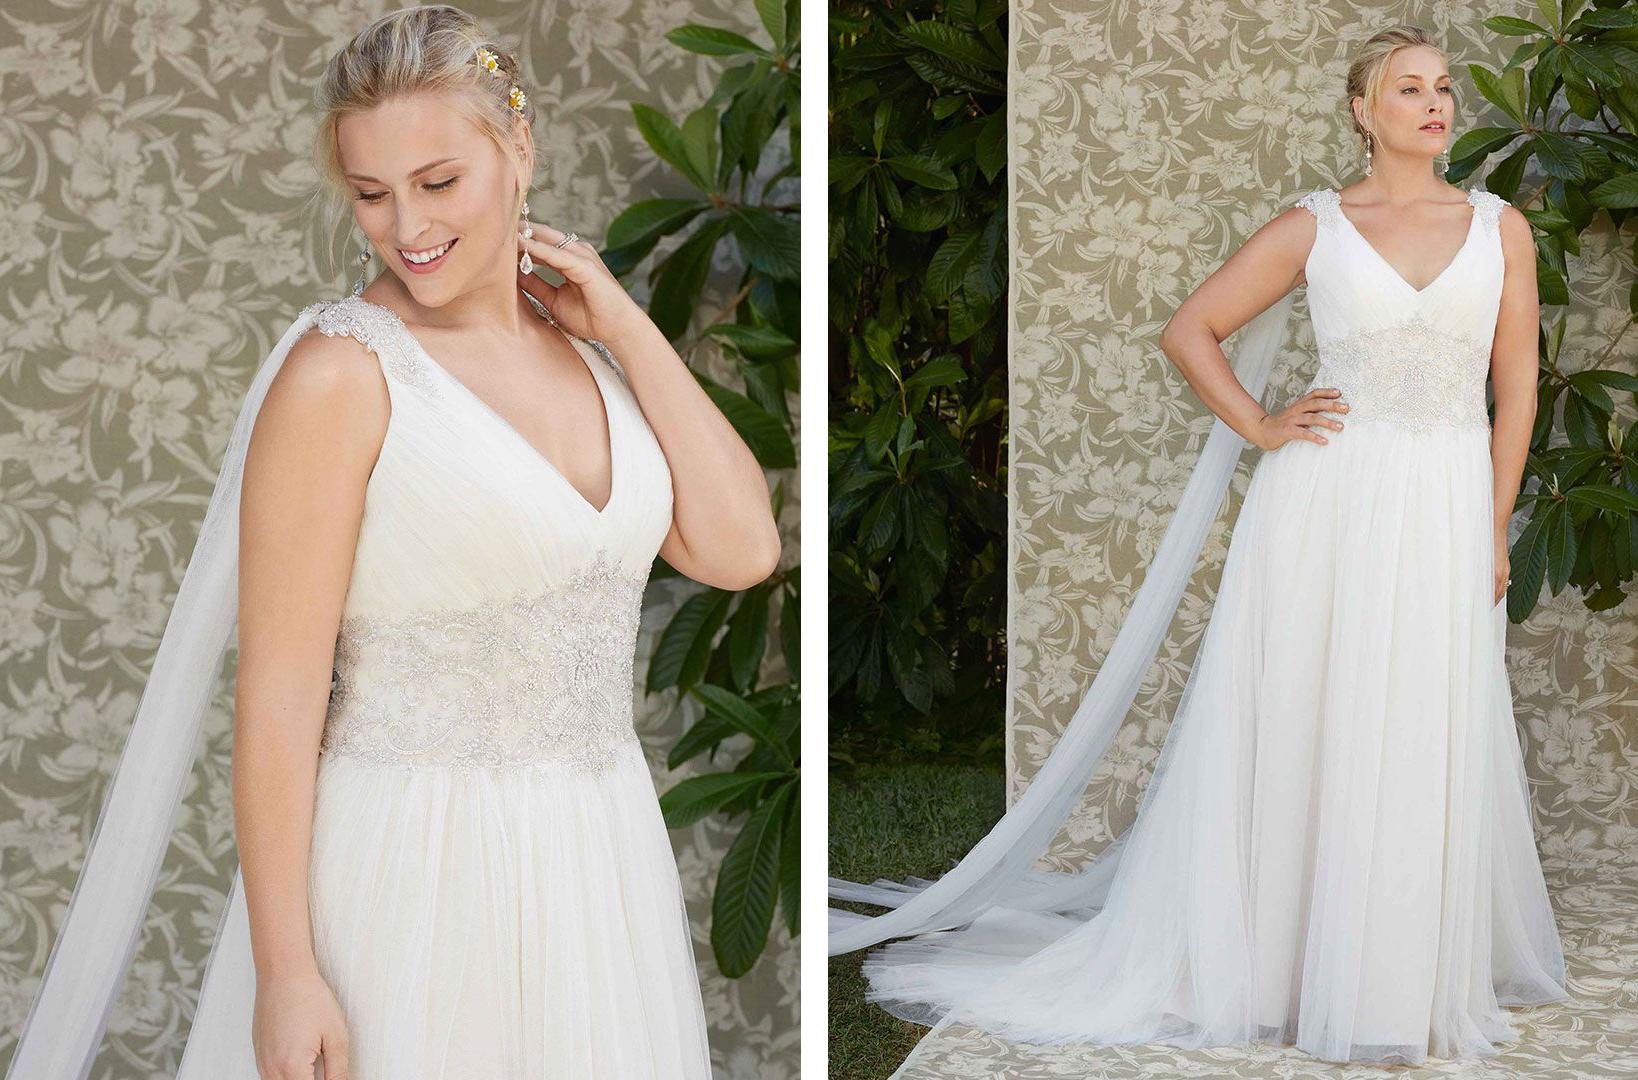 Plus Size Wedding Dress Collection